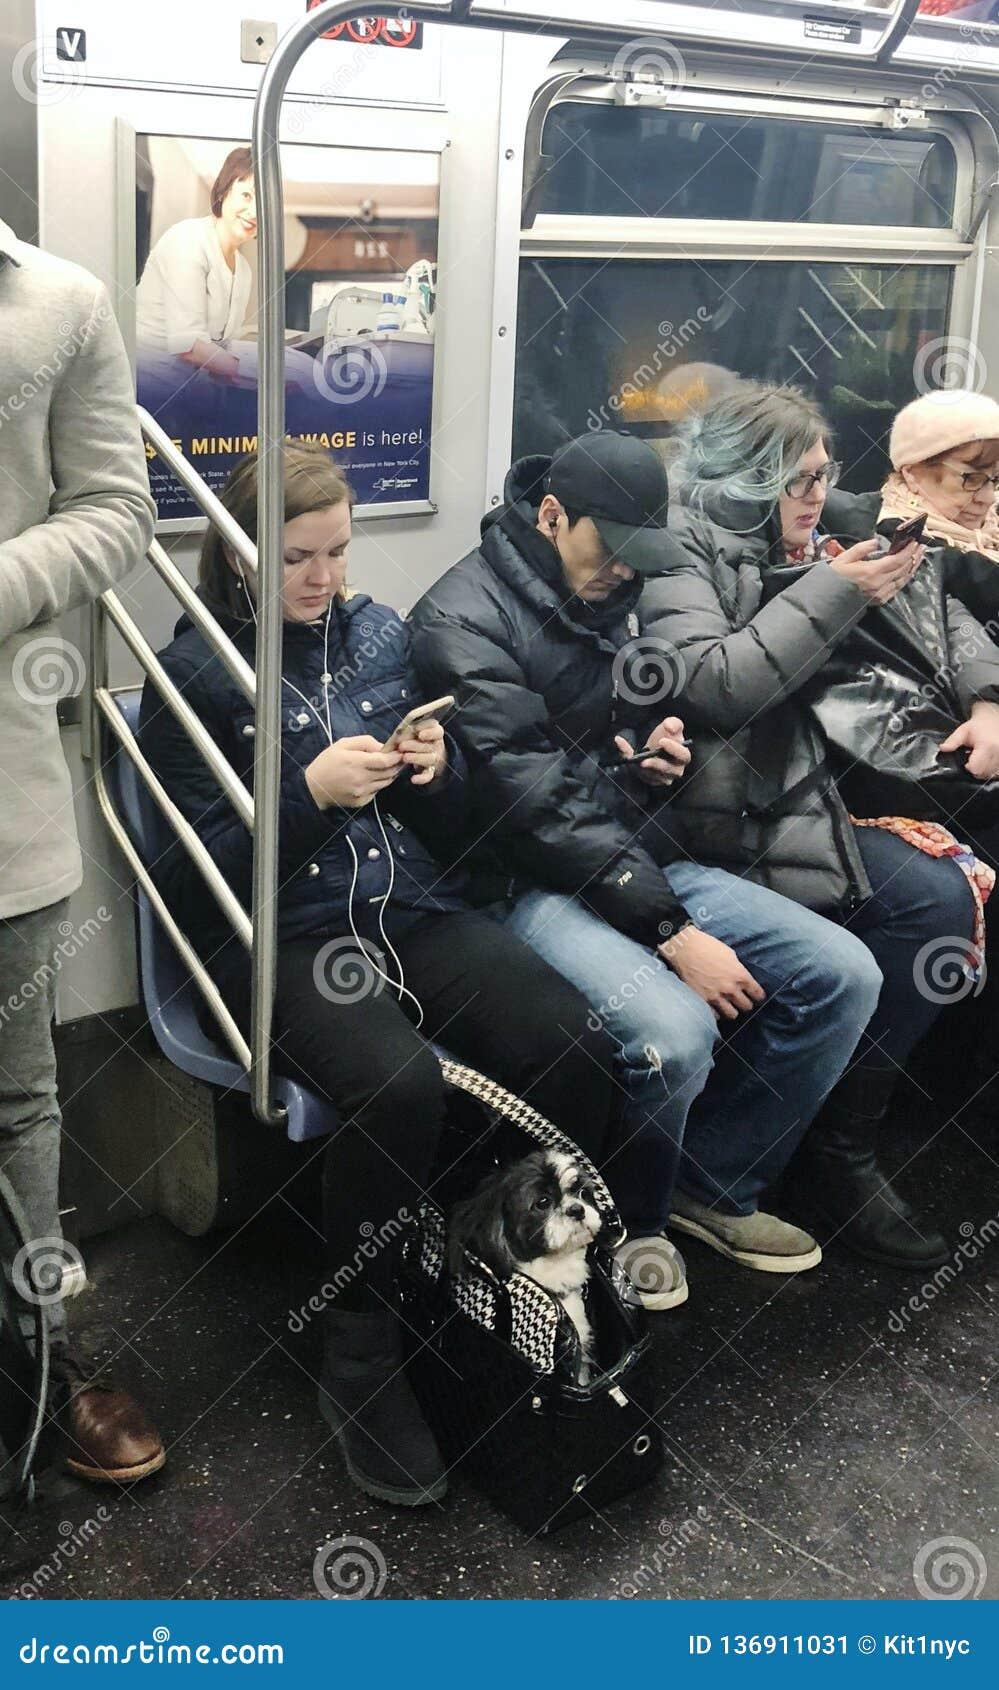 New York City People and Pet Animal Dog Riding Subway Car MTA Train NYC Urban Lifestyle